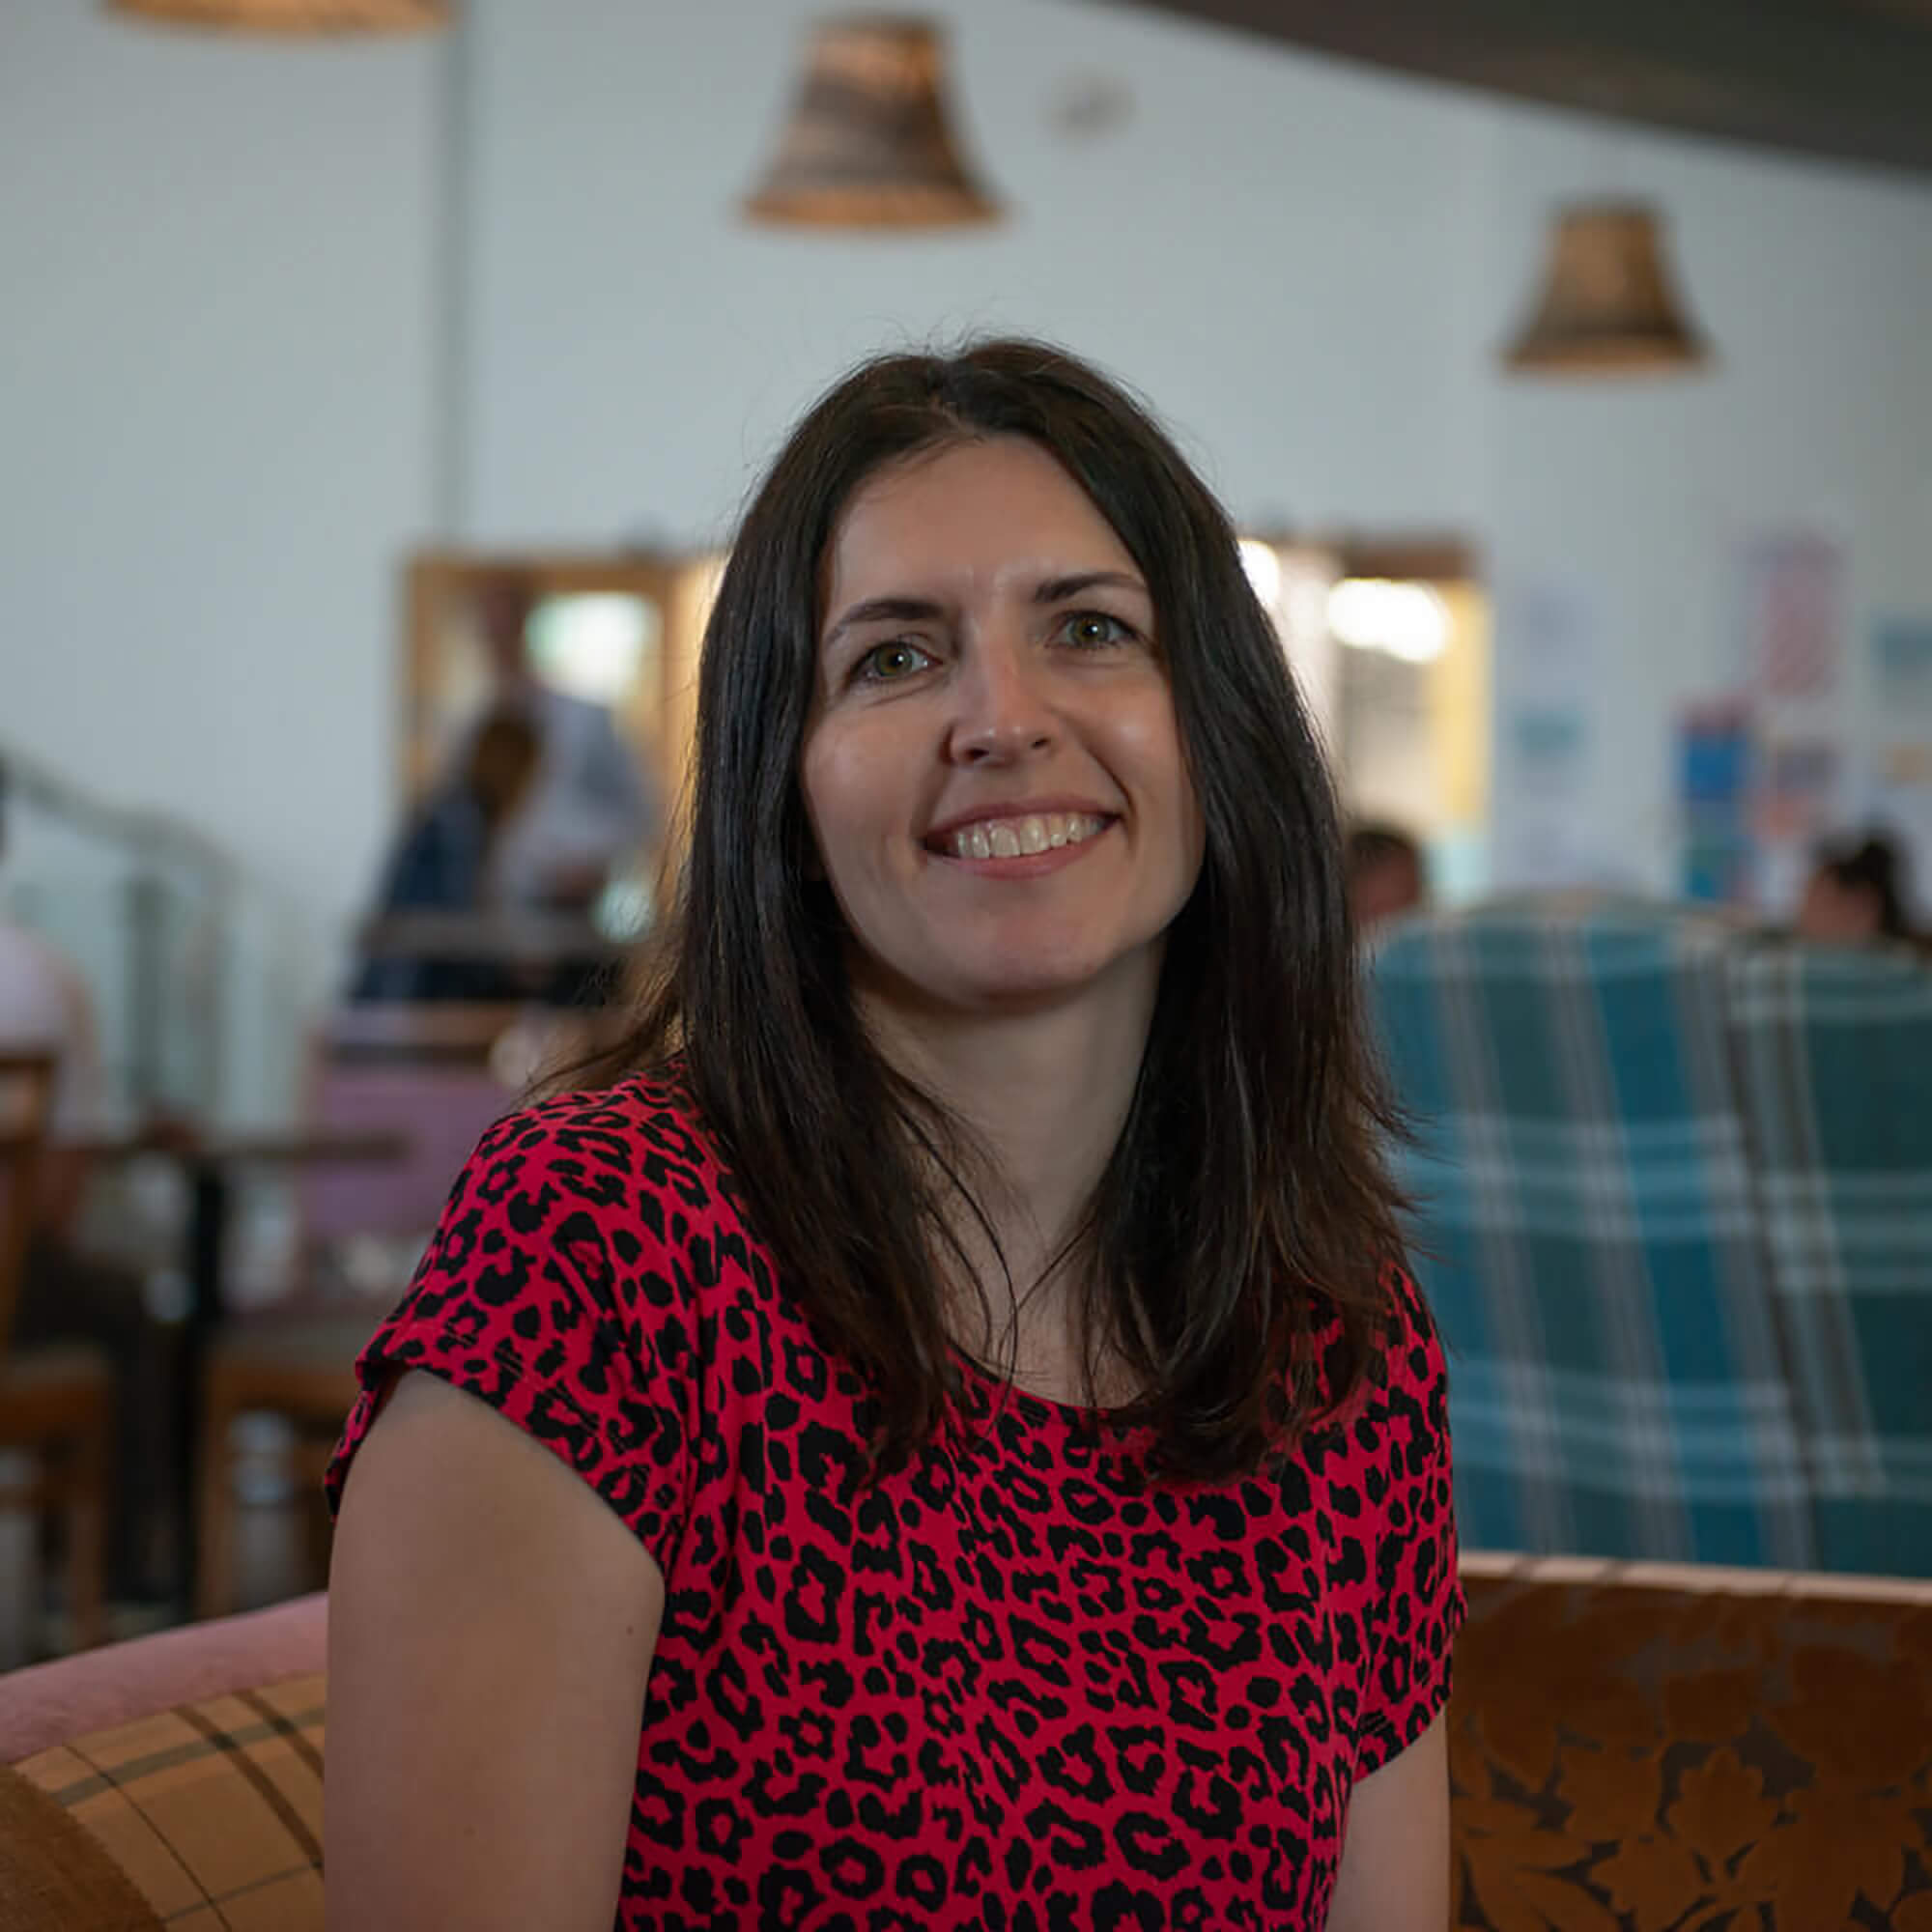 Rhona Woodward at Blends, University of Derby